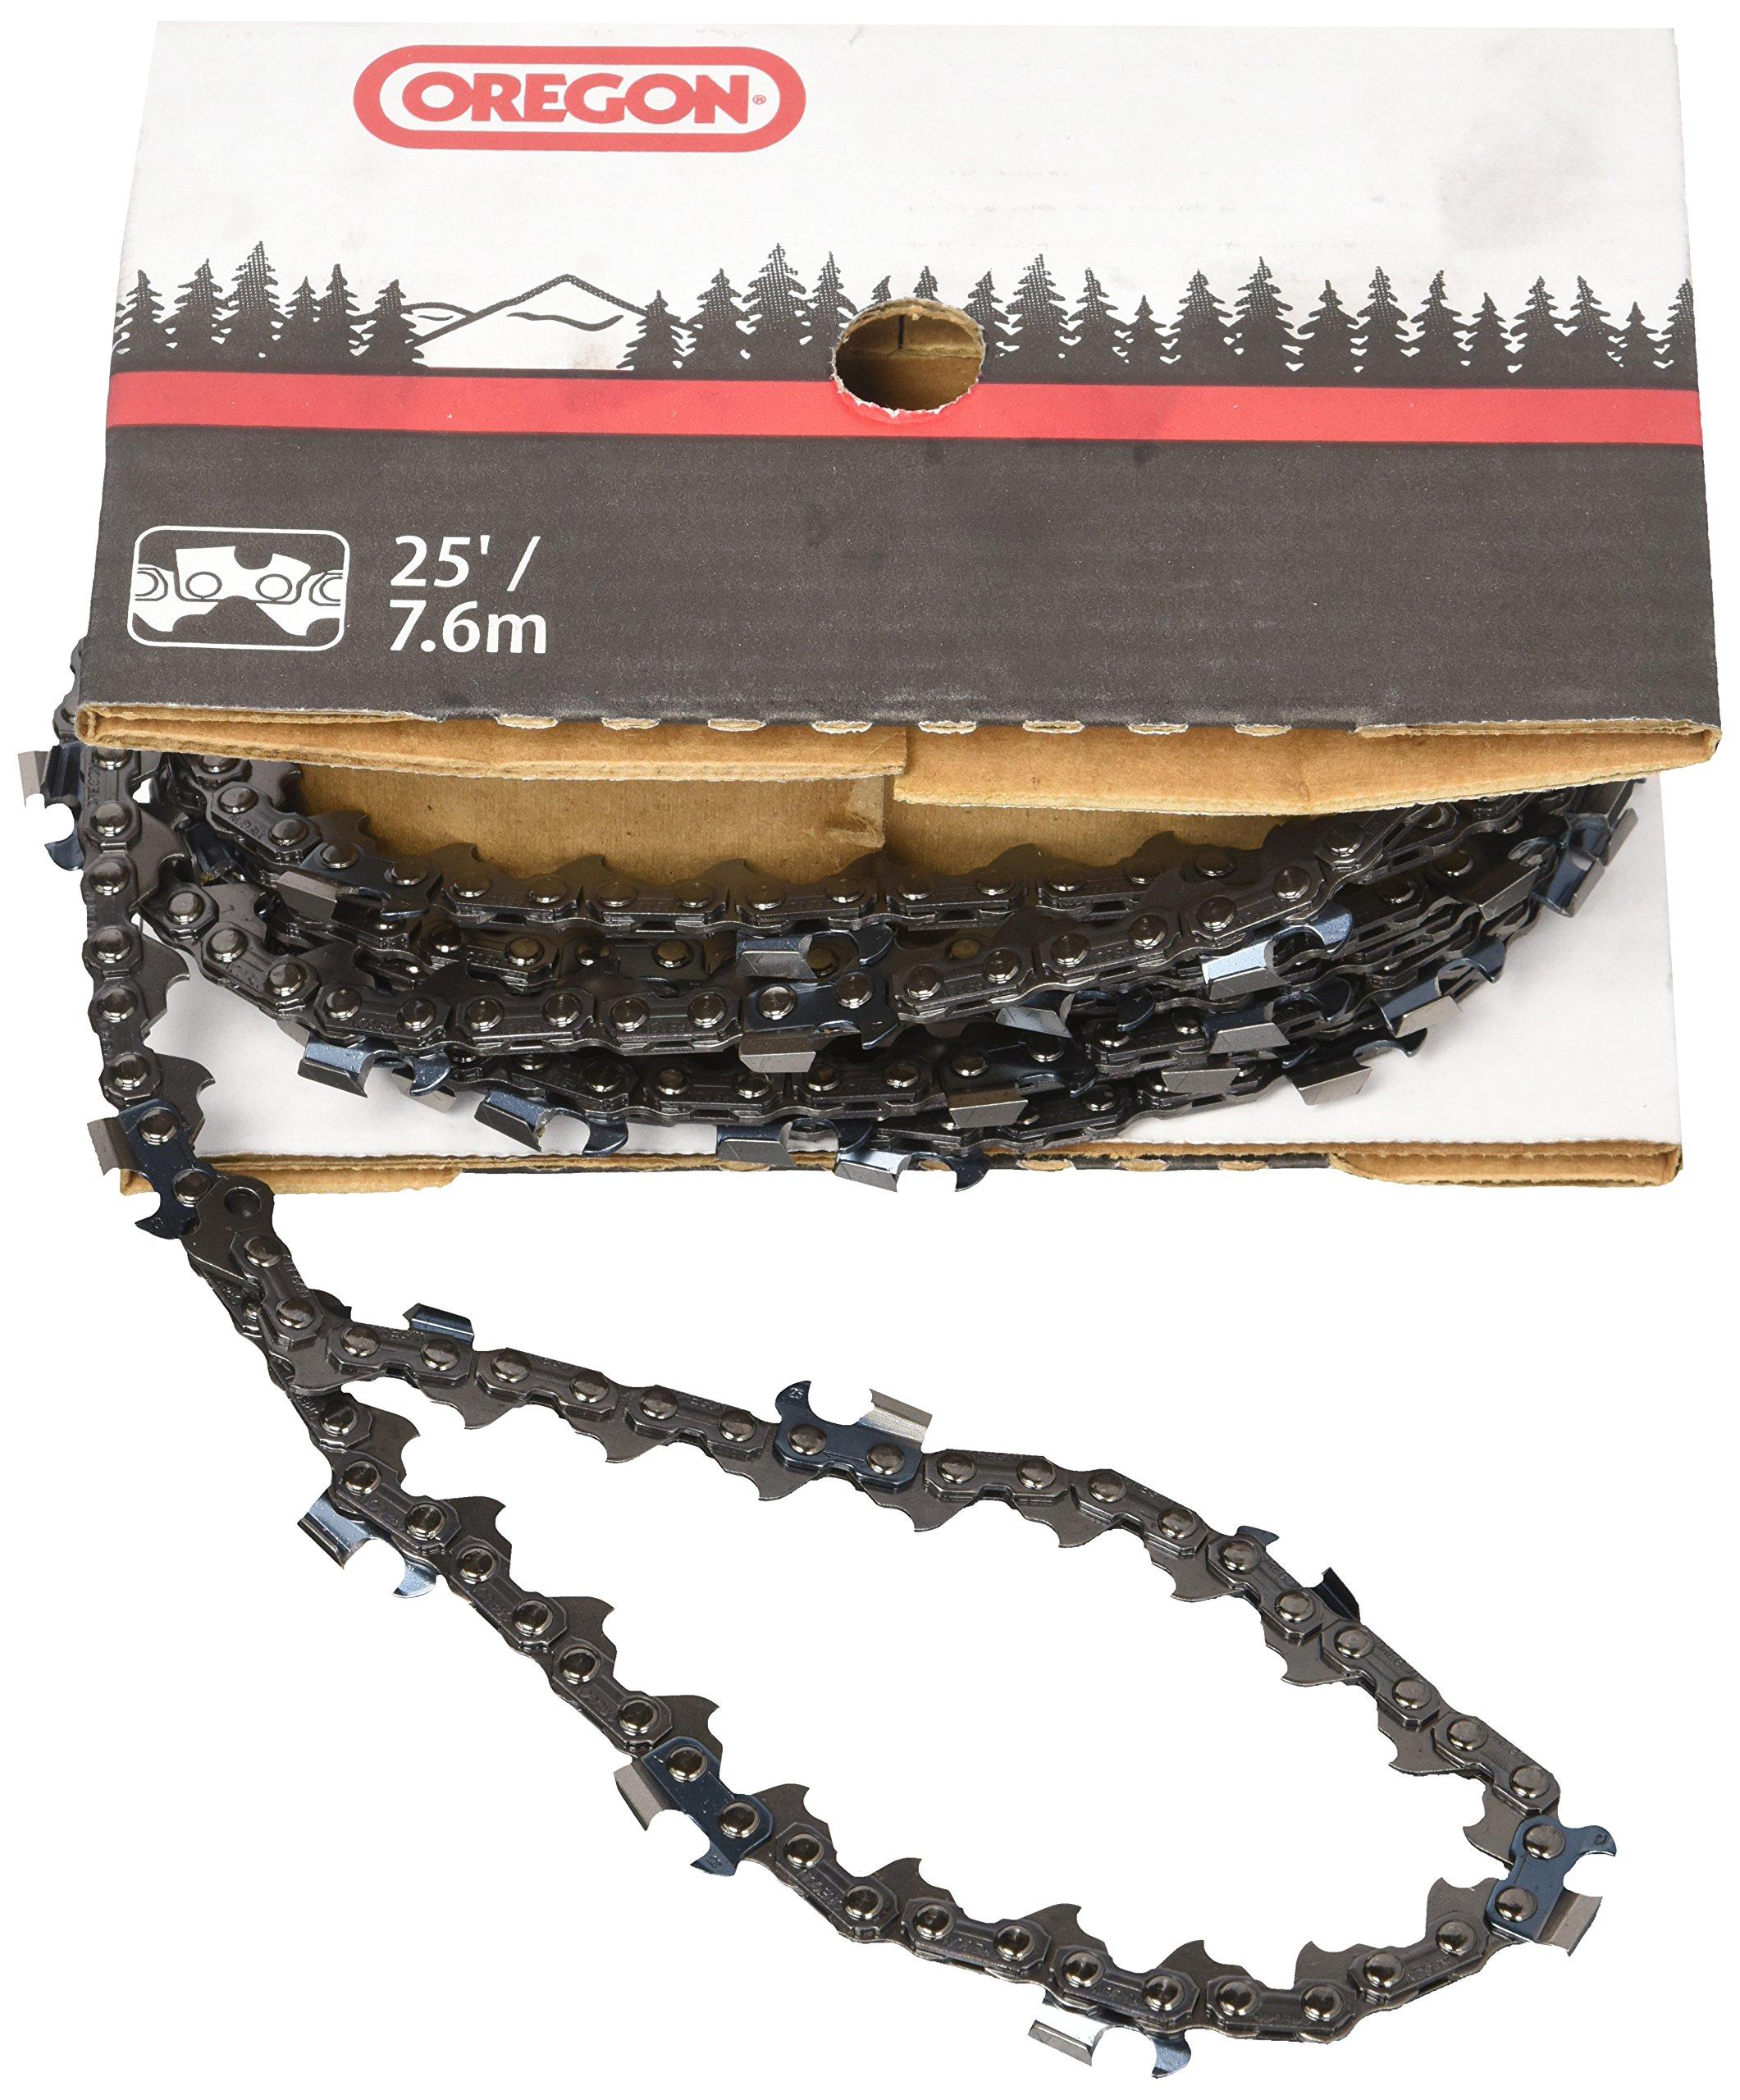 OREGON 73JGX025U 25-Feet Reel of Super Guard Skip Sequence Chain, 3/8-Inch